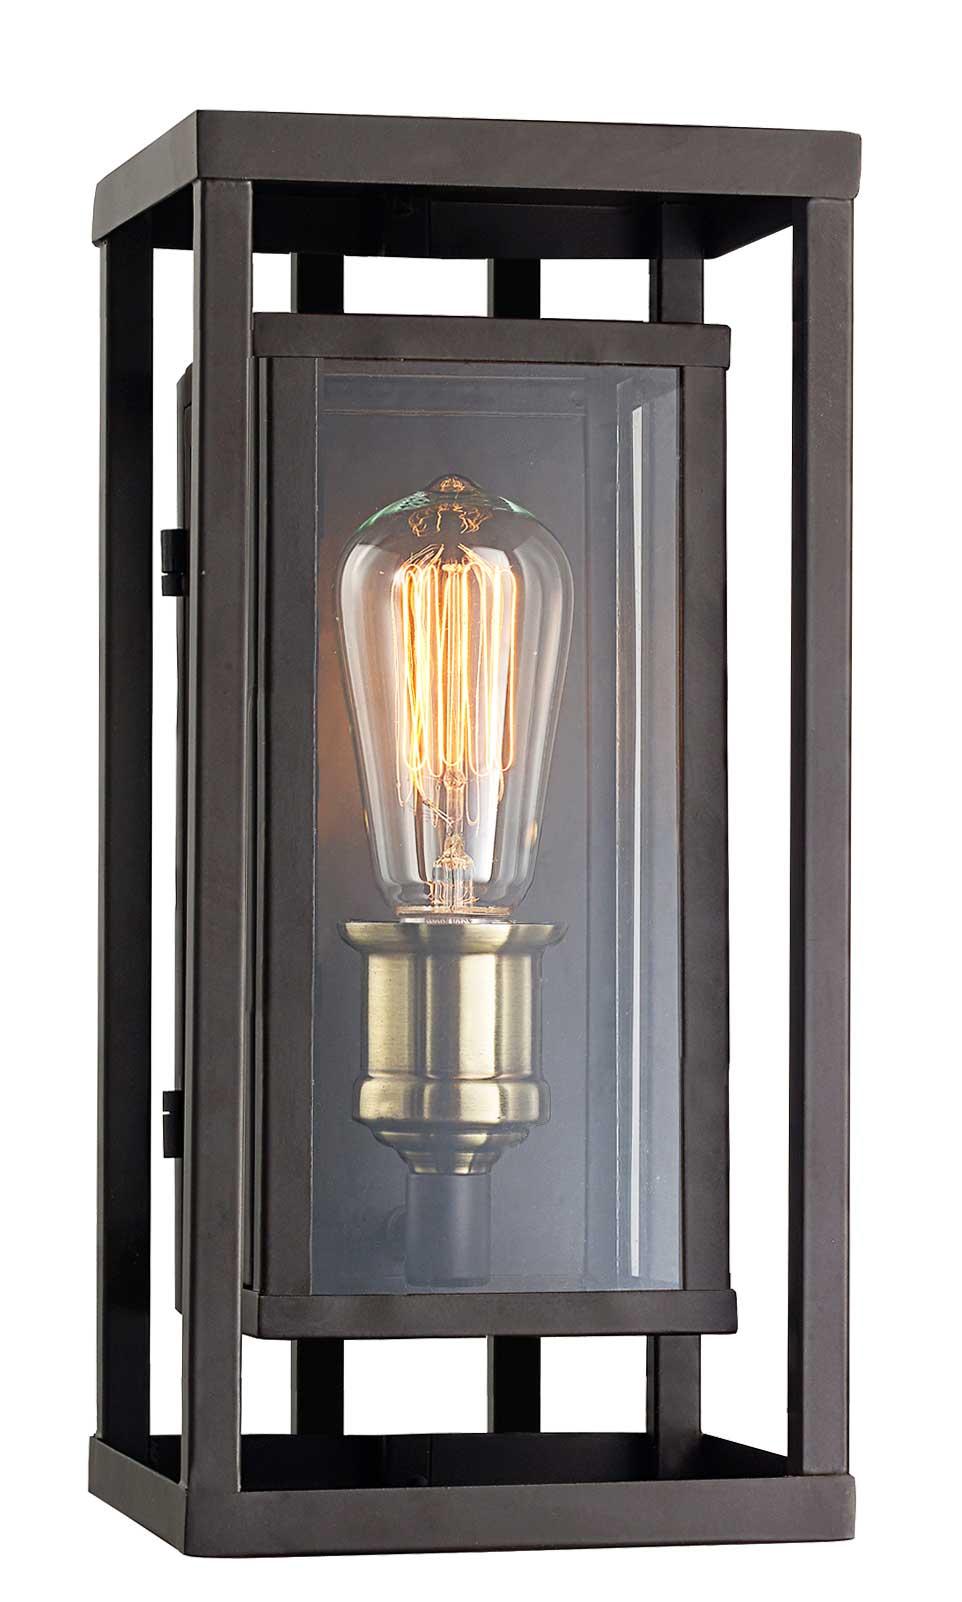 Trans Globe Lighting 50221 ROB